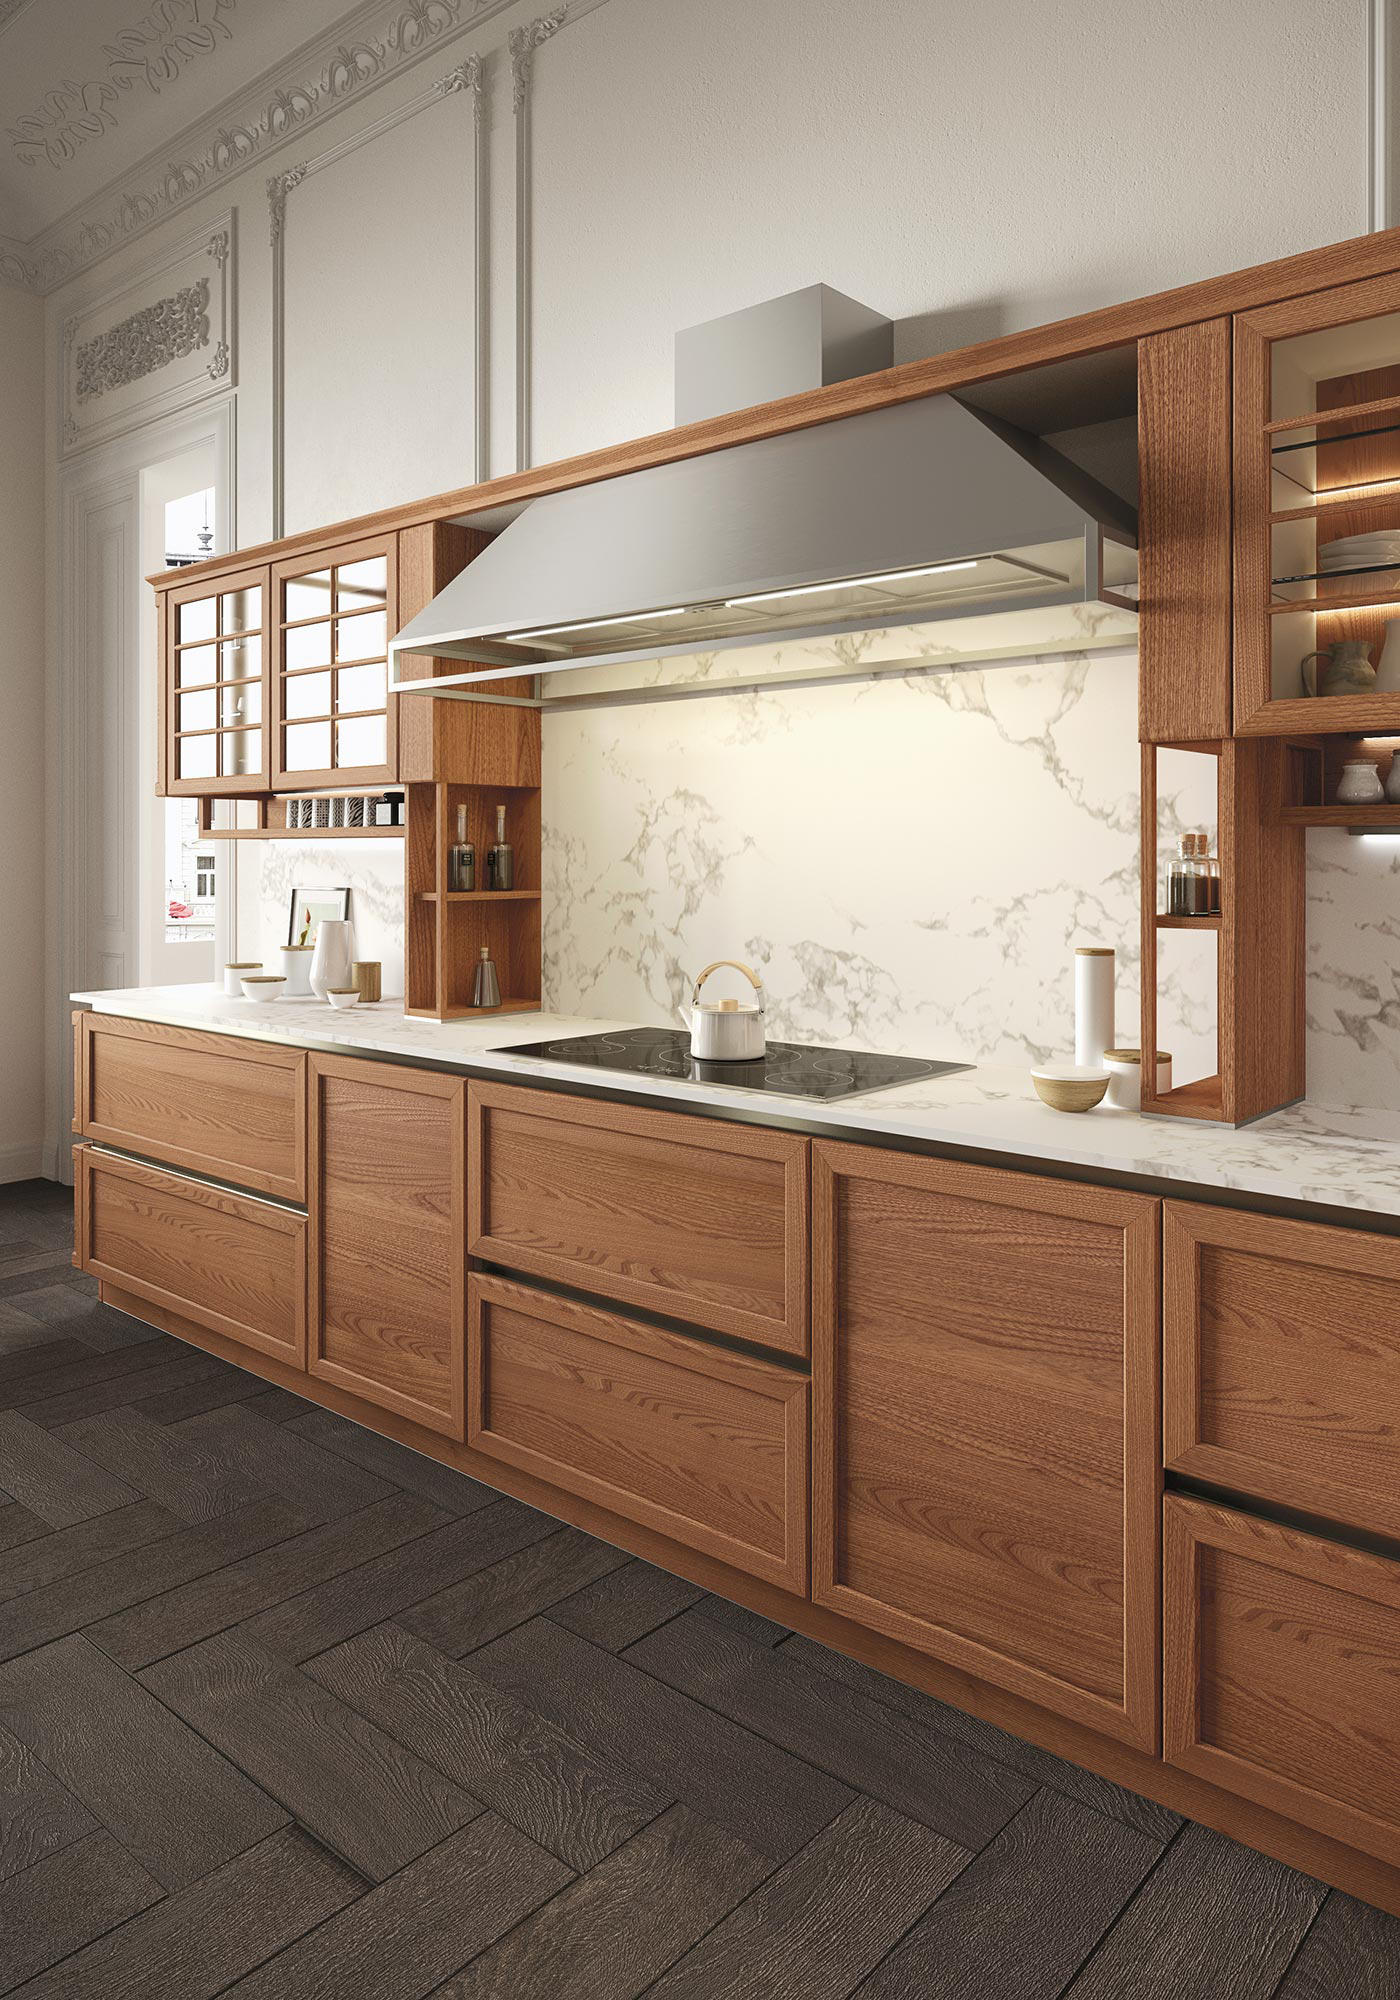 Heritage cucine a parete snaidero architonic - Cucine a parete ...